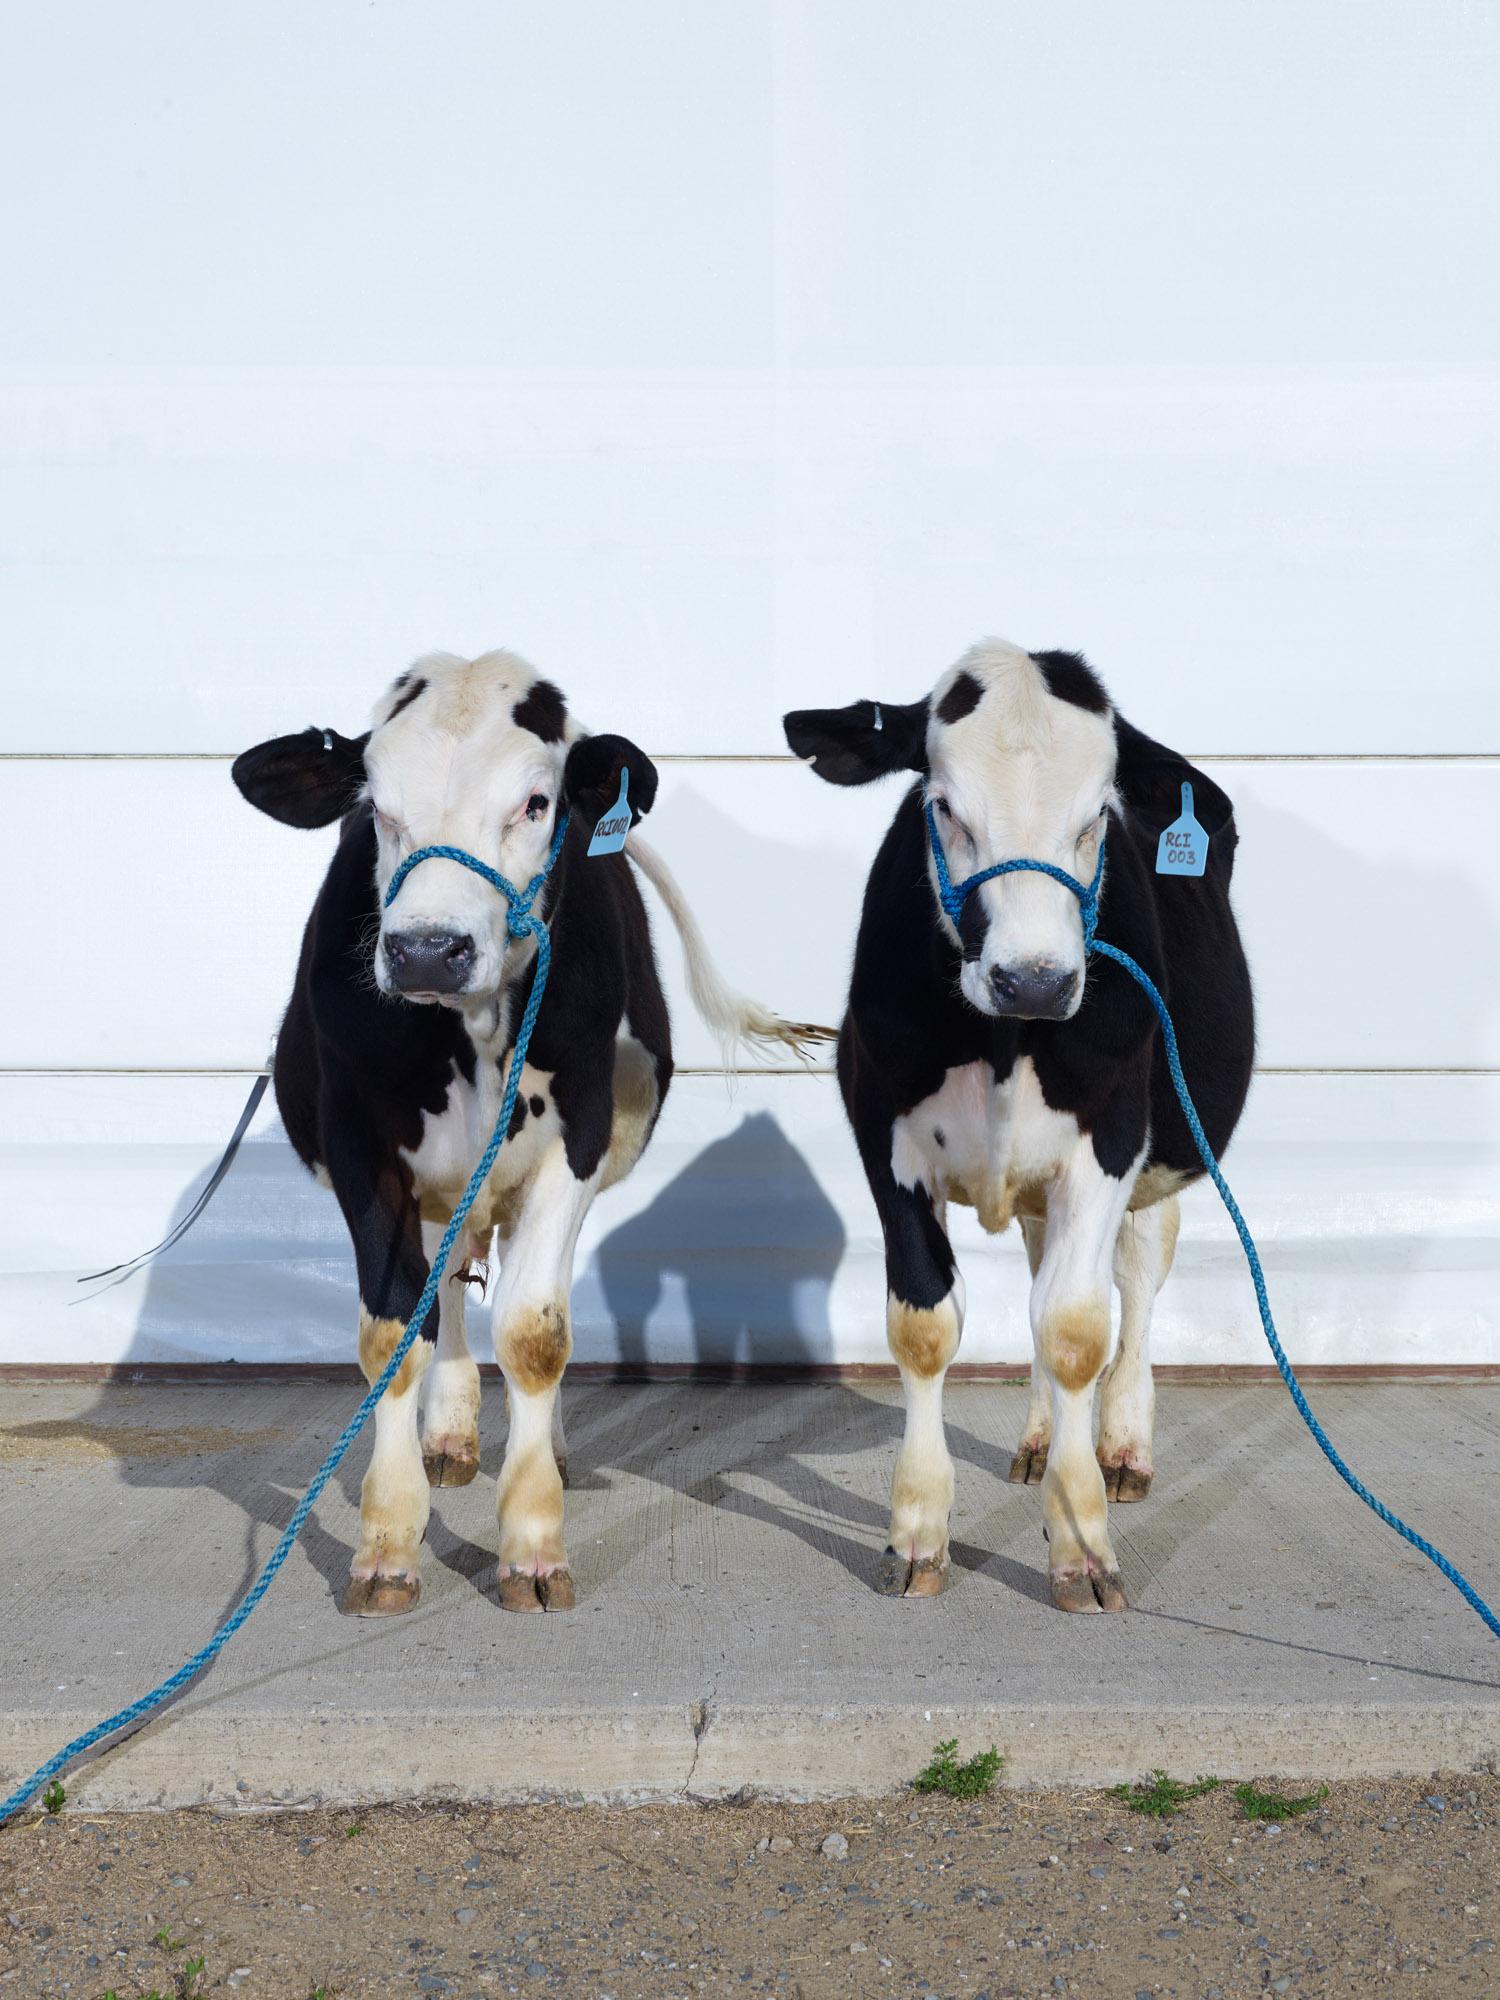 Genetically Modified Hornless Bull Clones, Davis, California, 2016